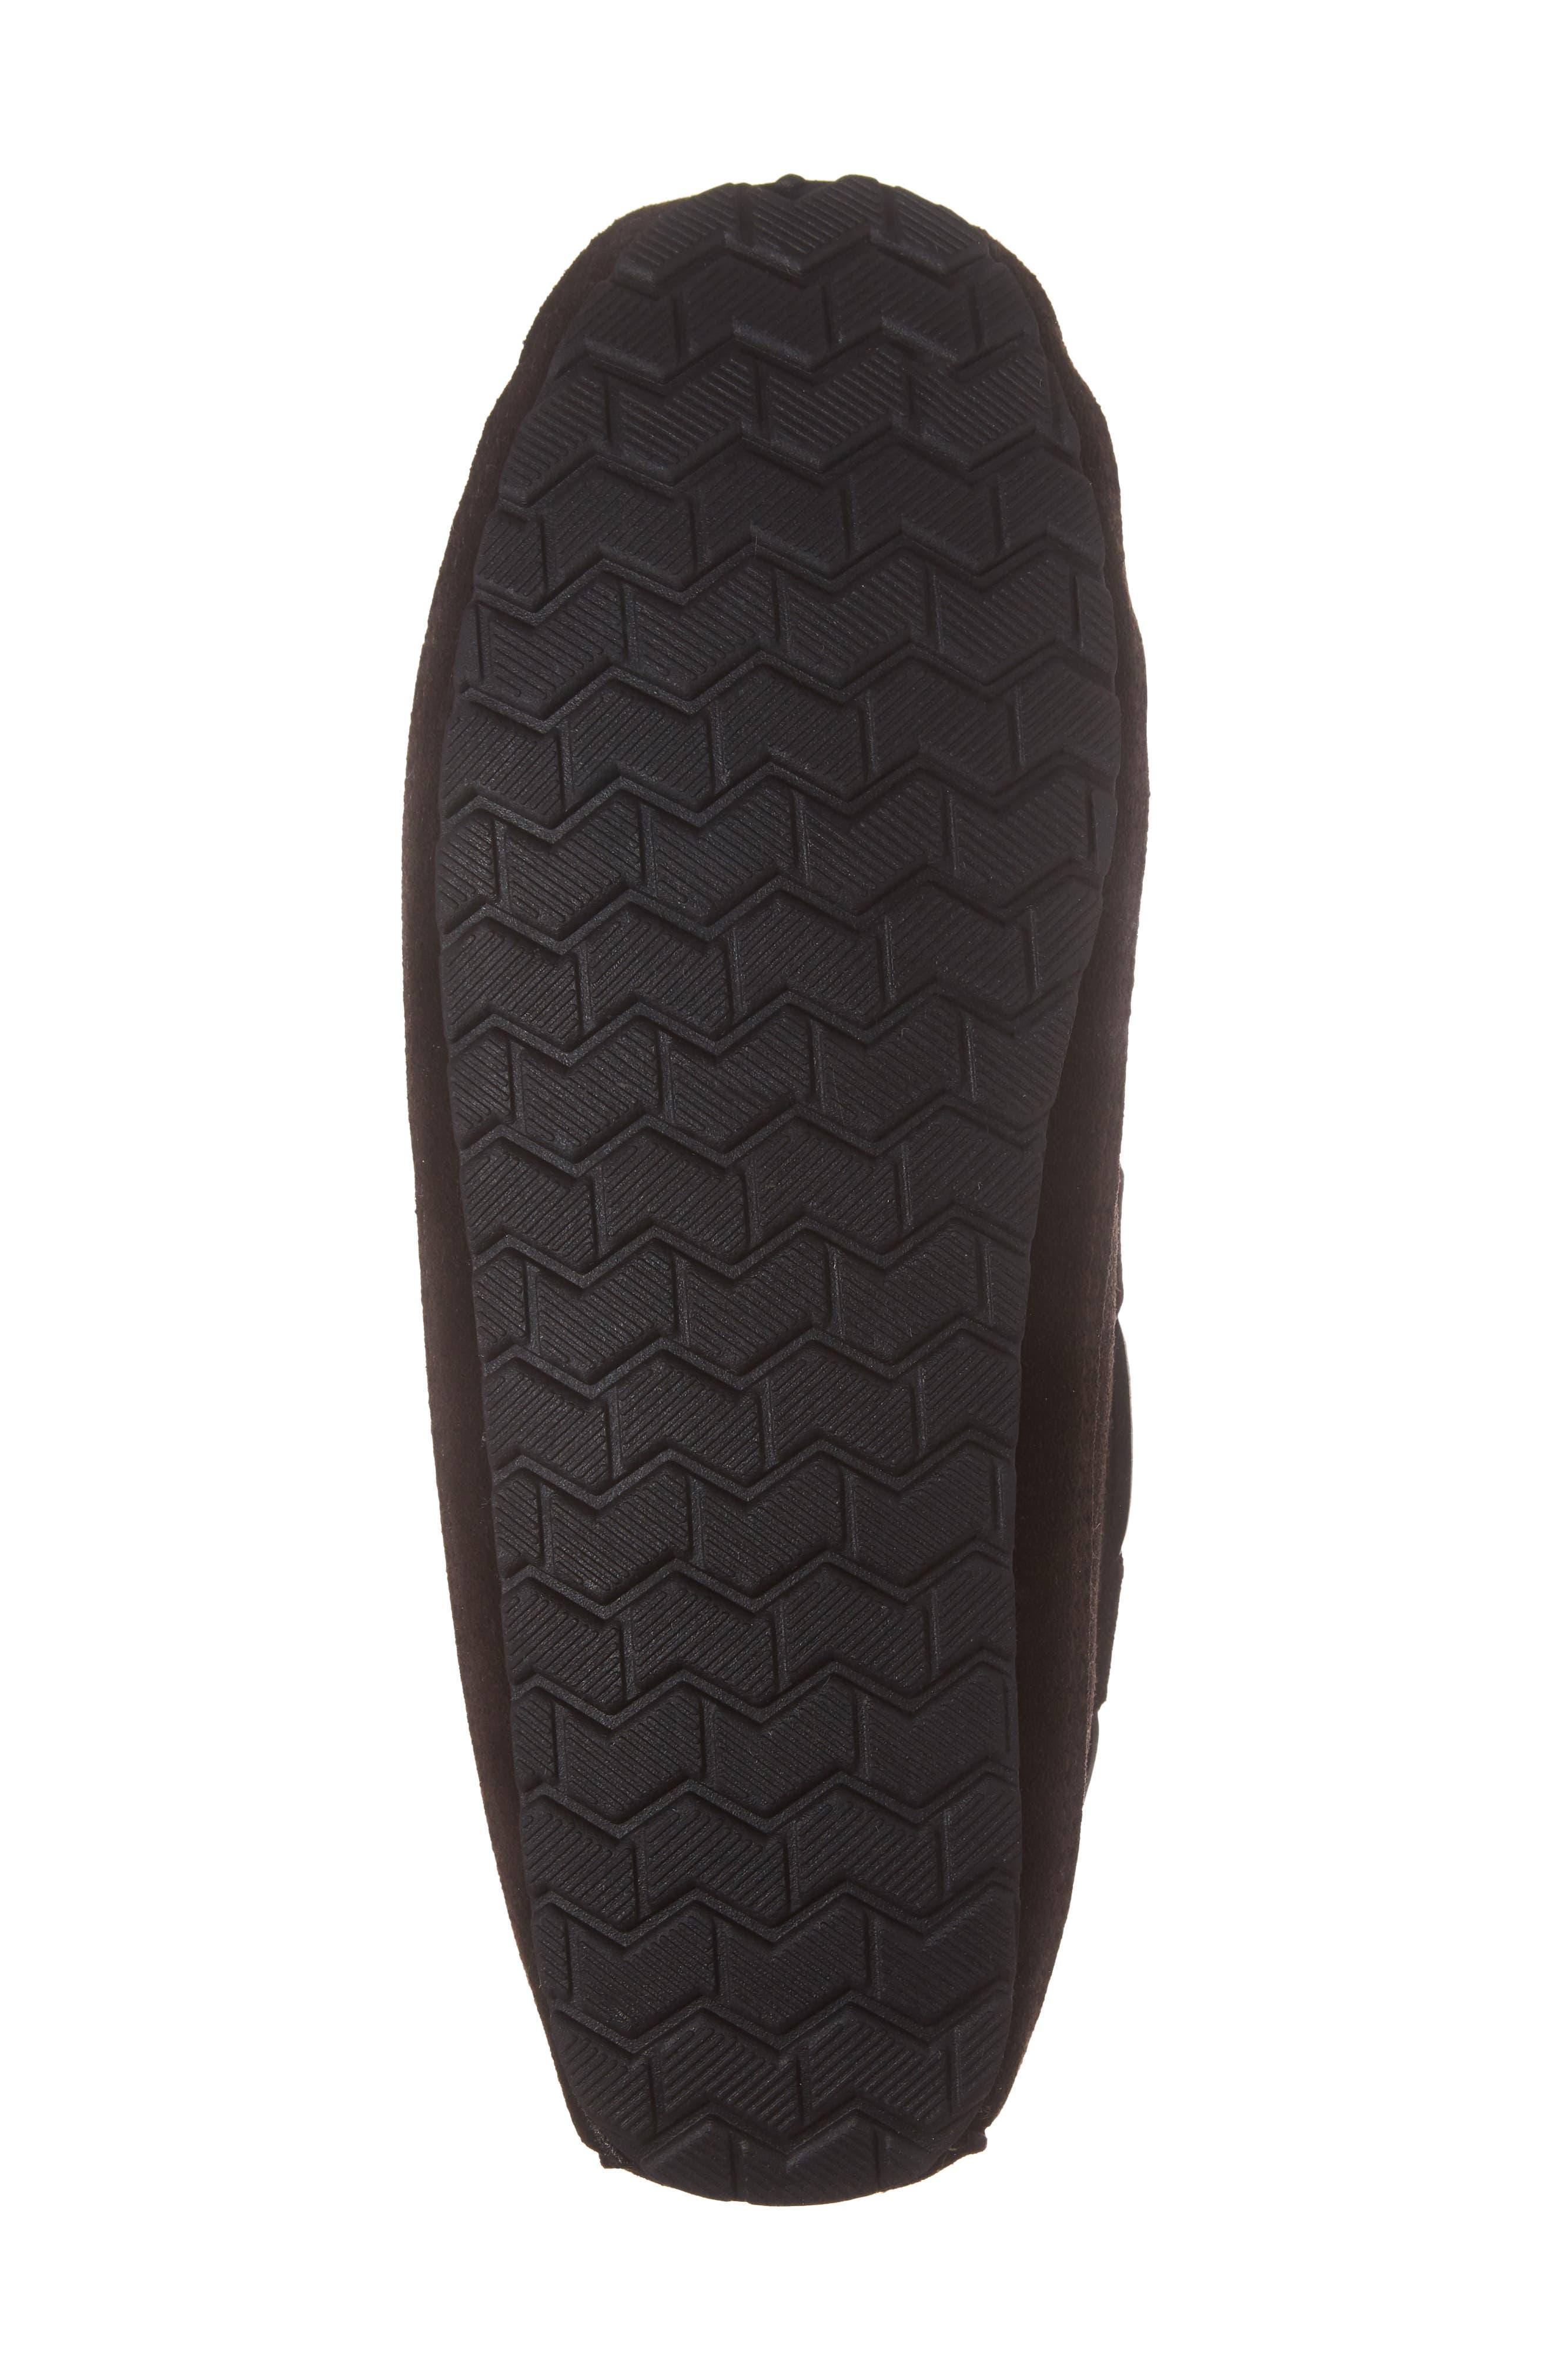 Arizona Genuine Shearling Lined Sandal,                             Alternate thumbnail 6, color,                             200